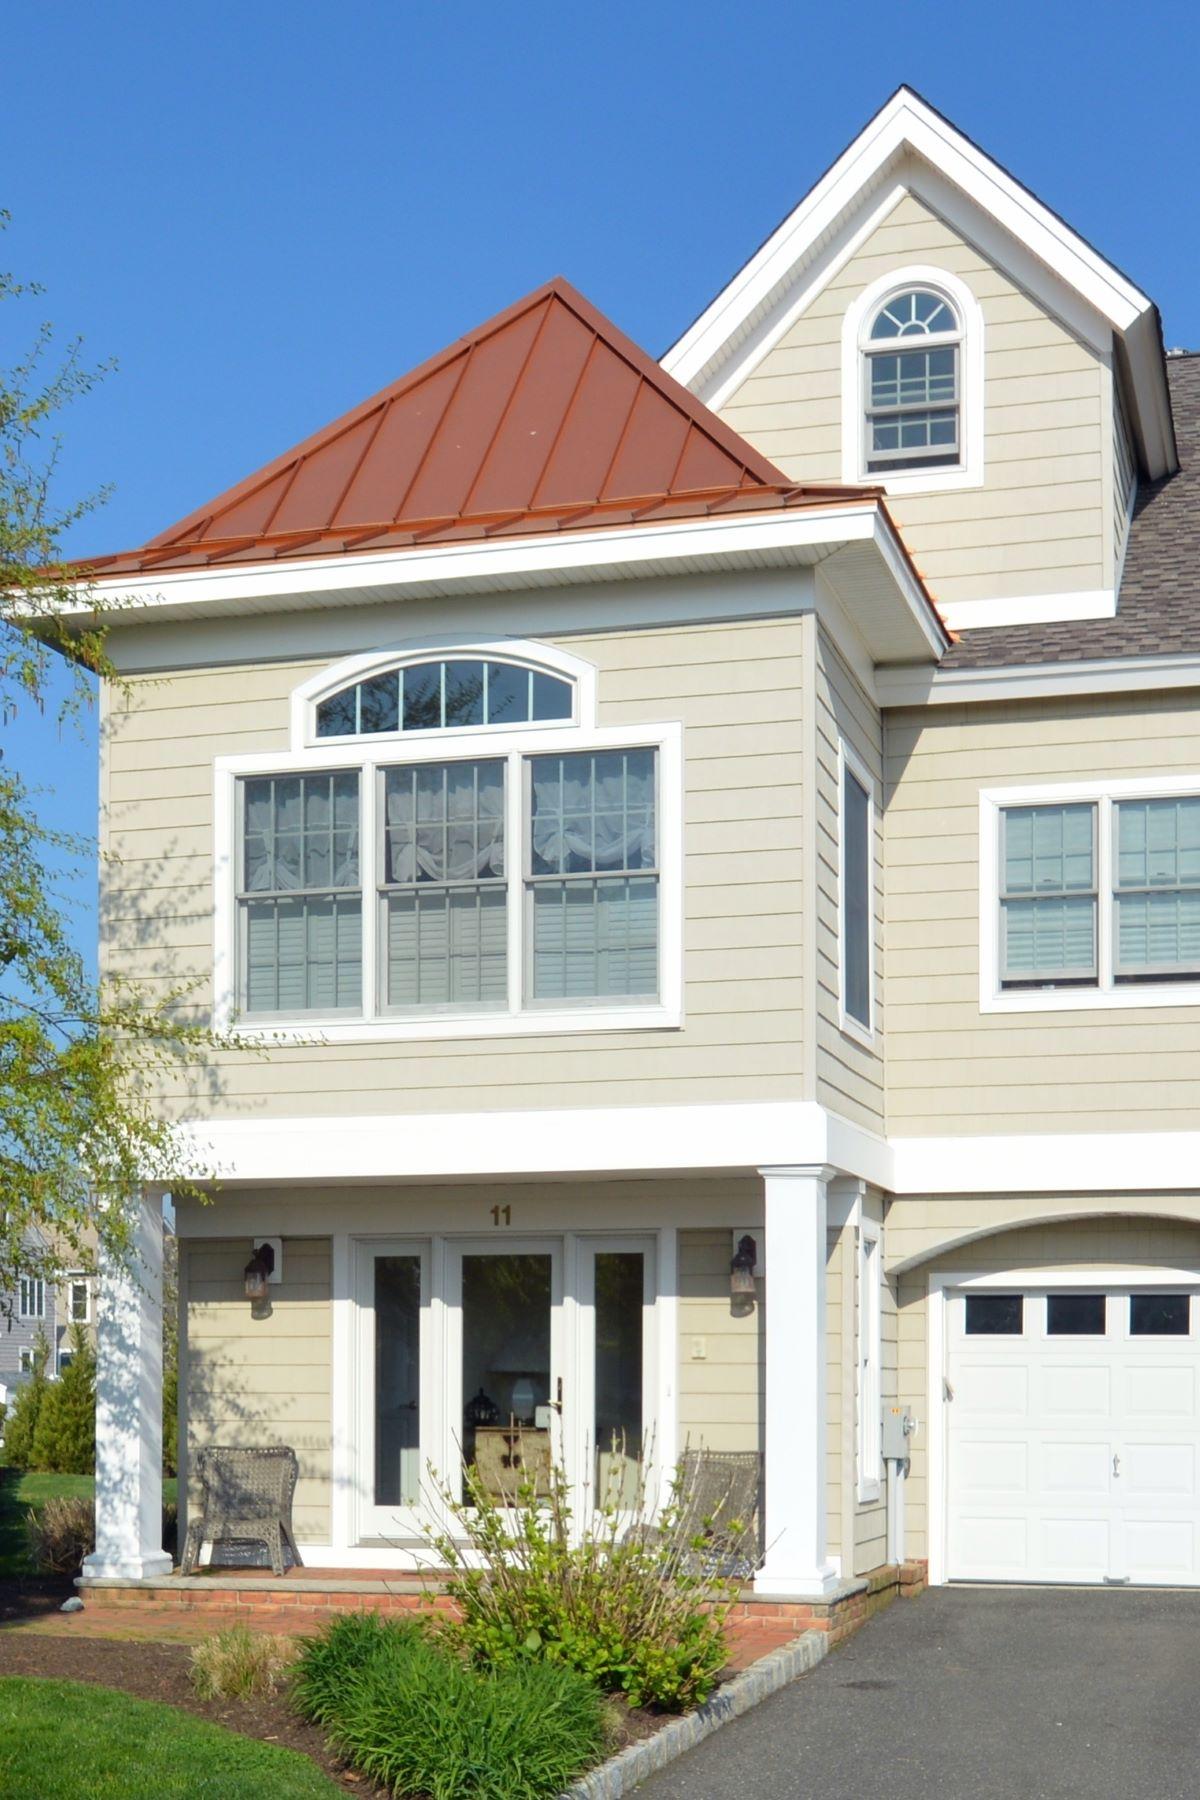 Condomínio para Venda às Stunning Custom Townhome 11 Waters Edge Brielle, Nova Jersey, 08730 Estados Unidos